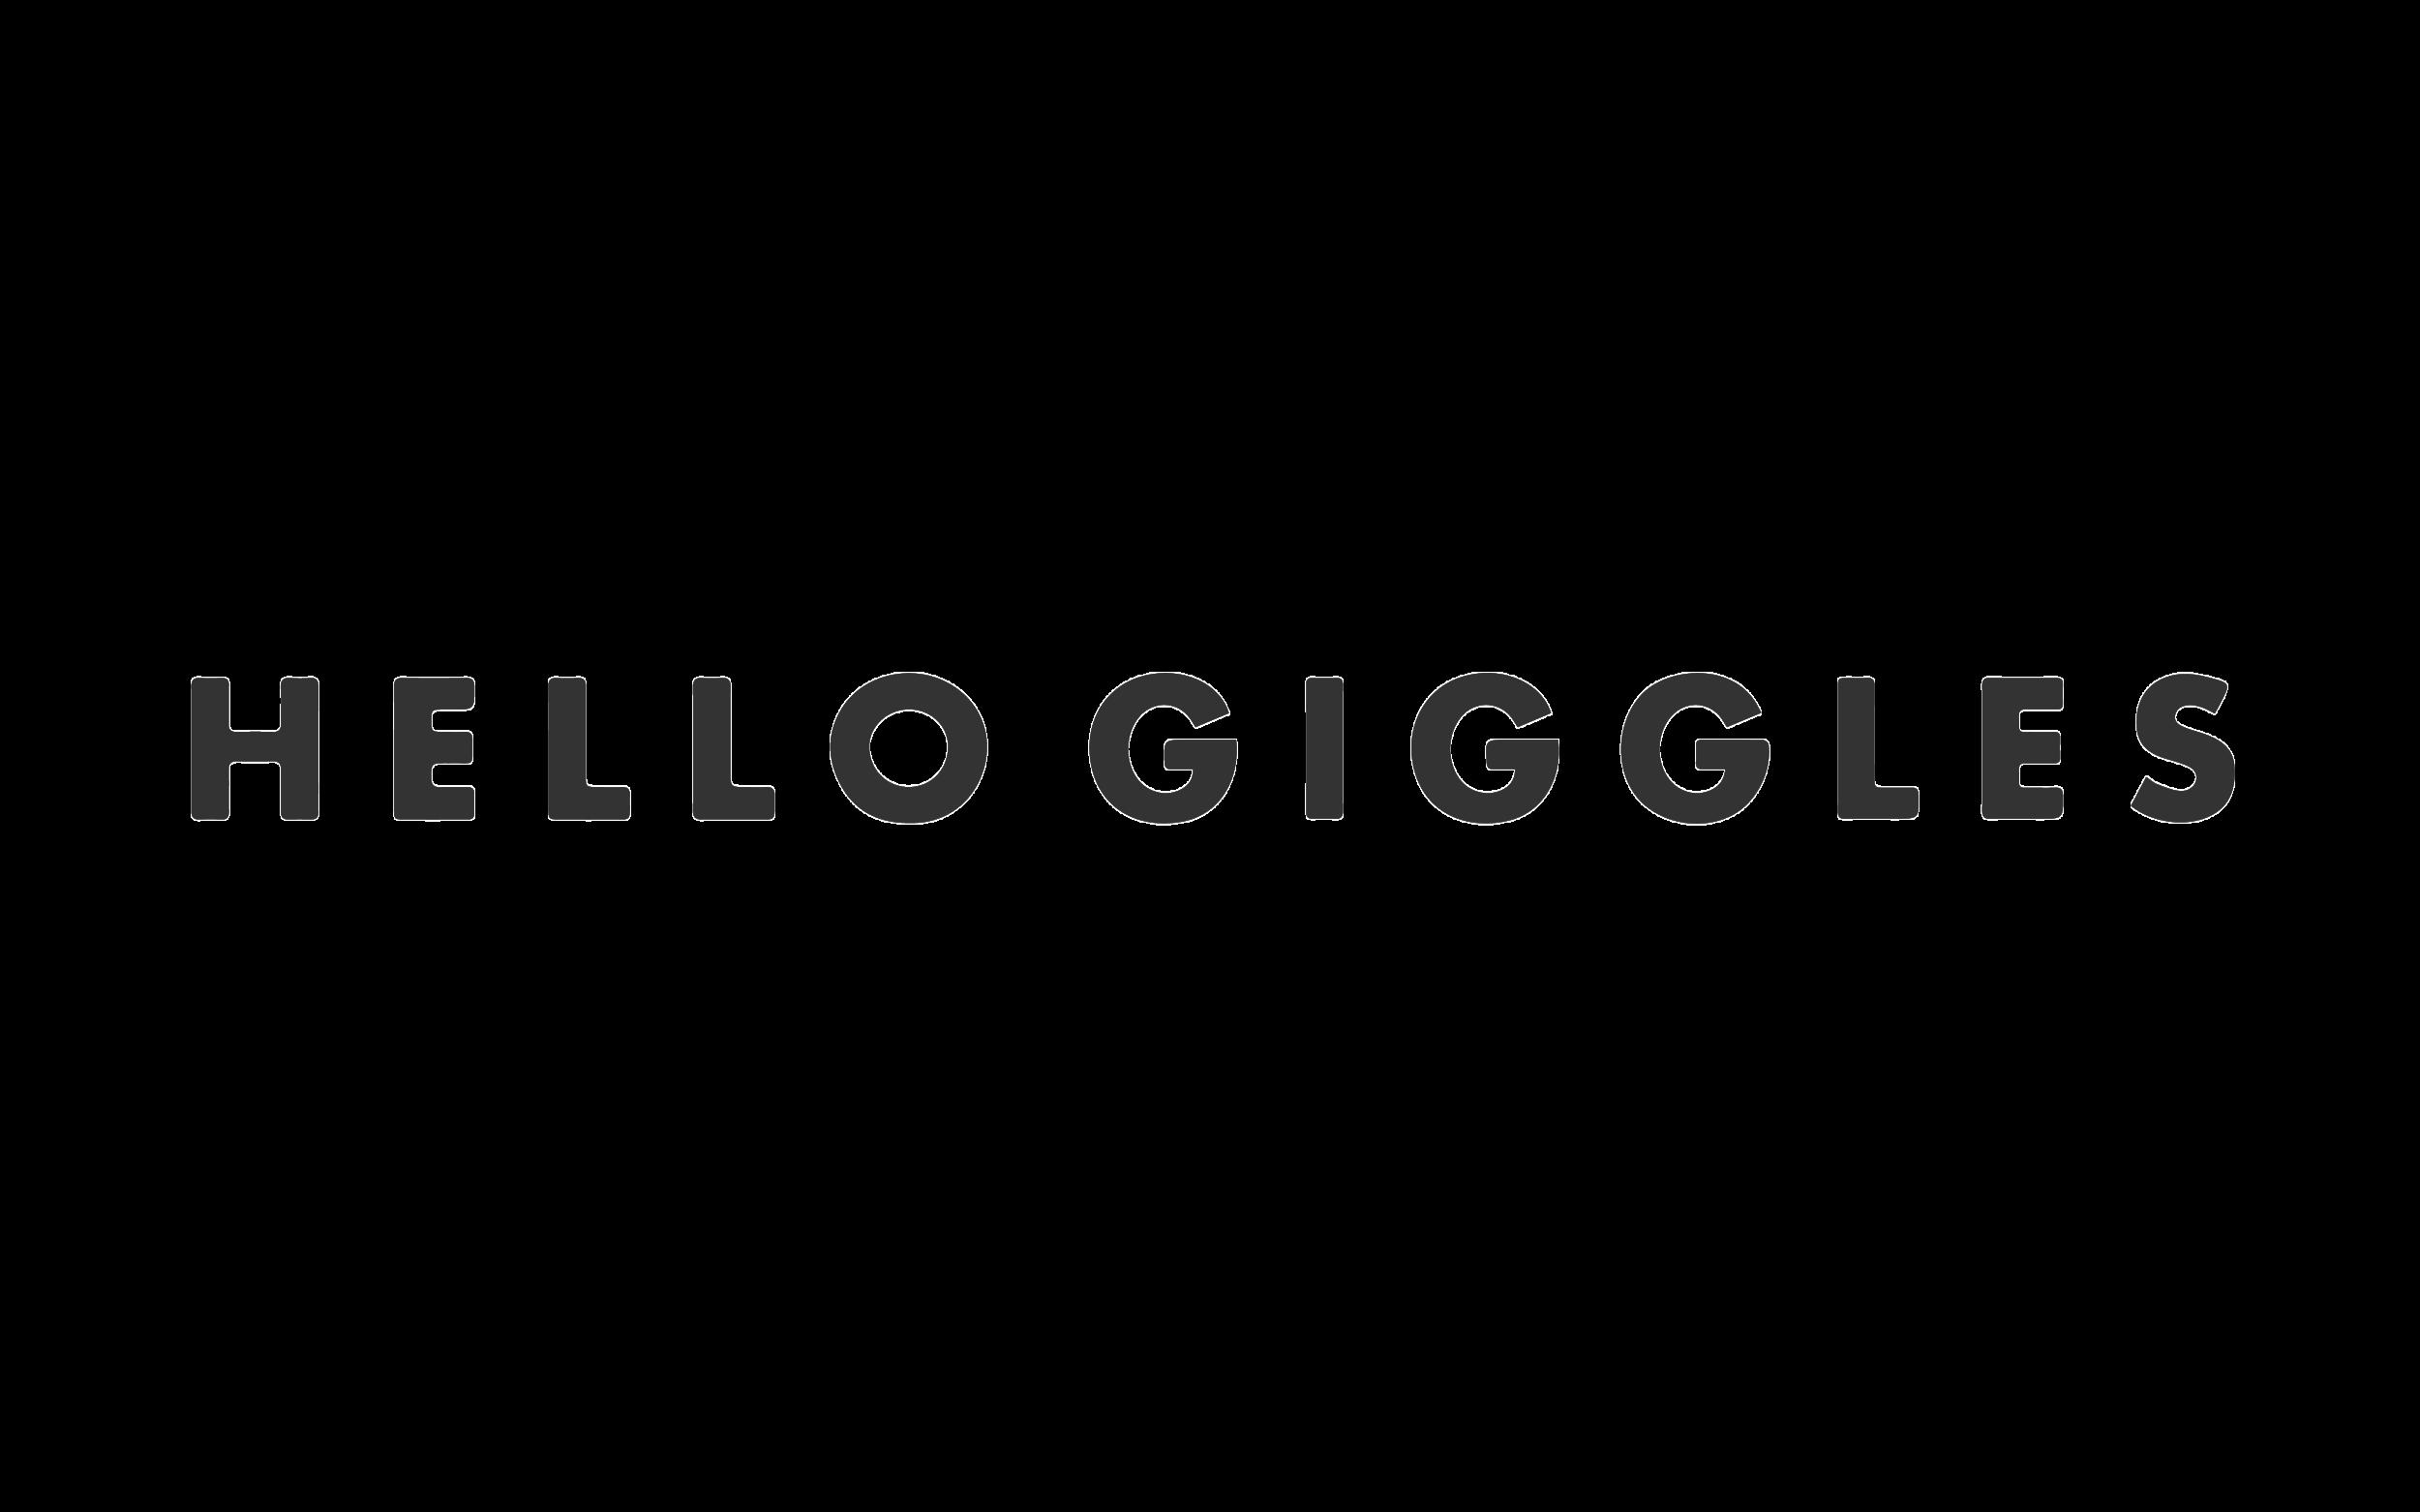 hello-press-logo.png